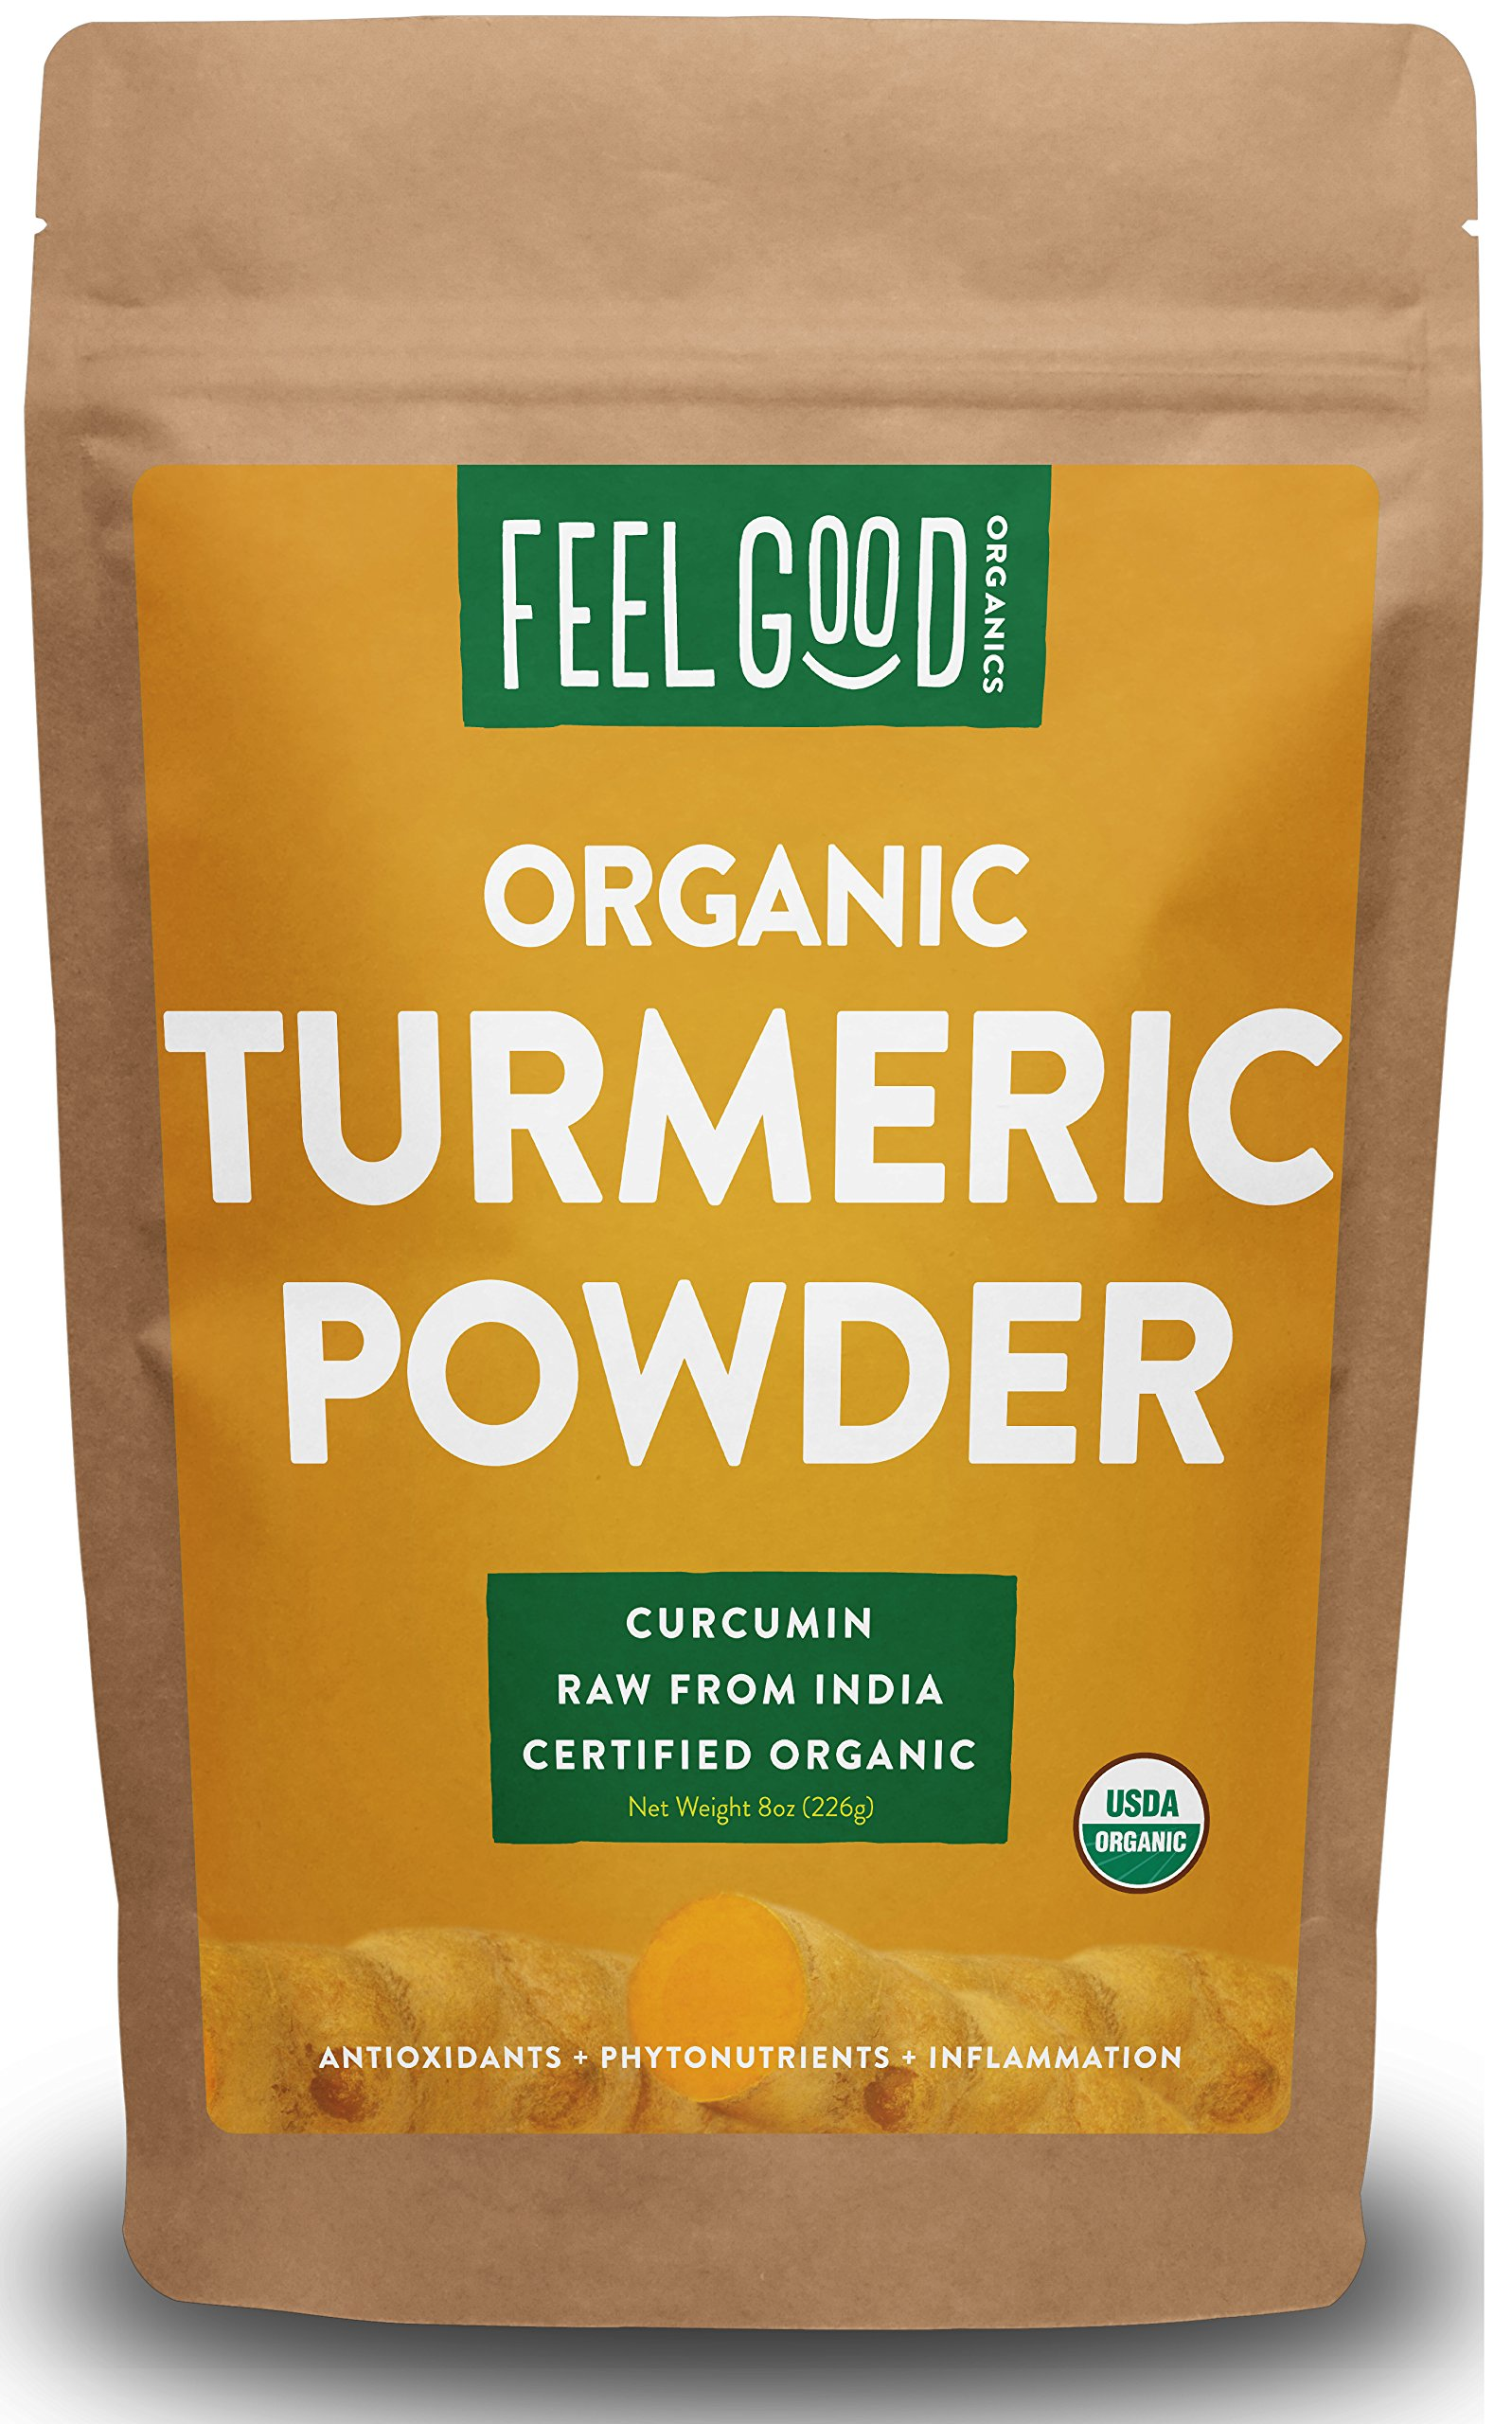 Organic Turmeric Powder - 8oz Resealable Bag - 100% Raw w/Curcumin From India - by Feel Good Organics